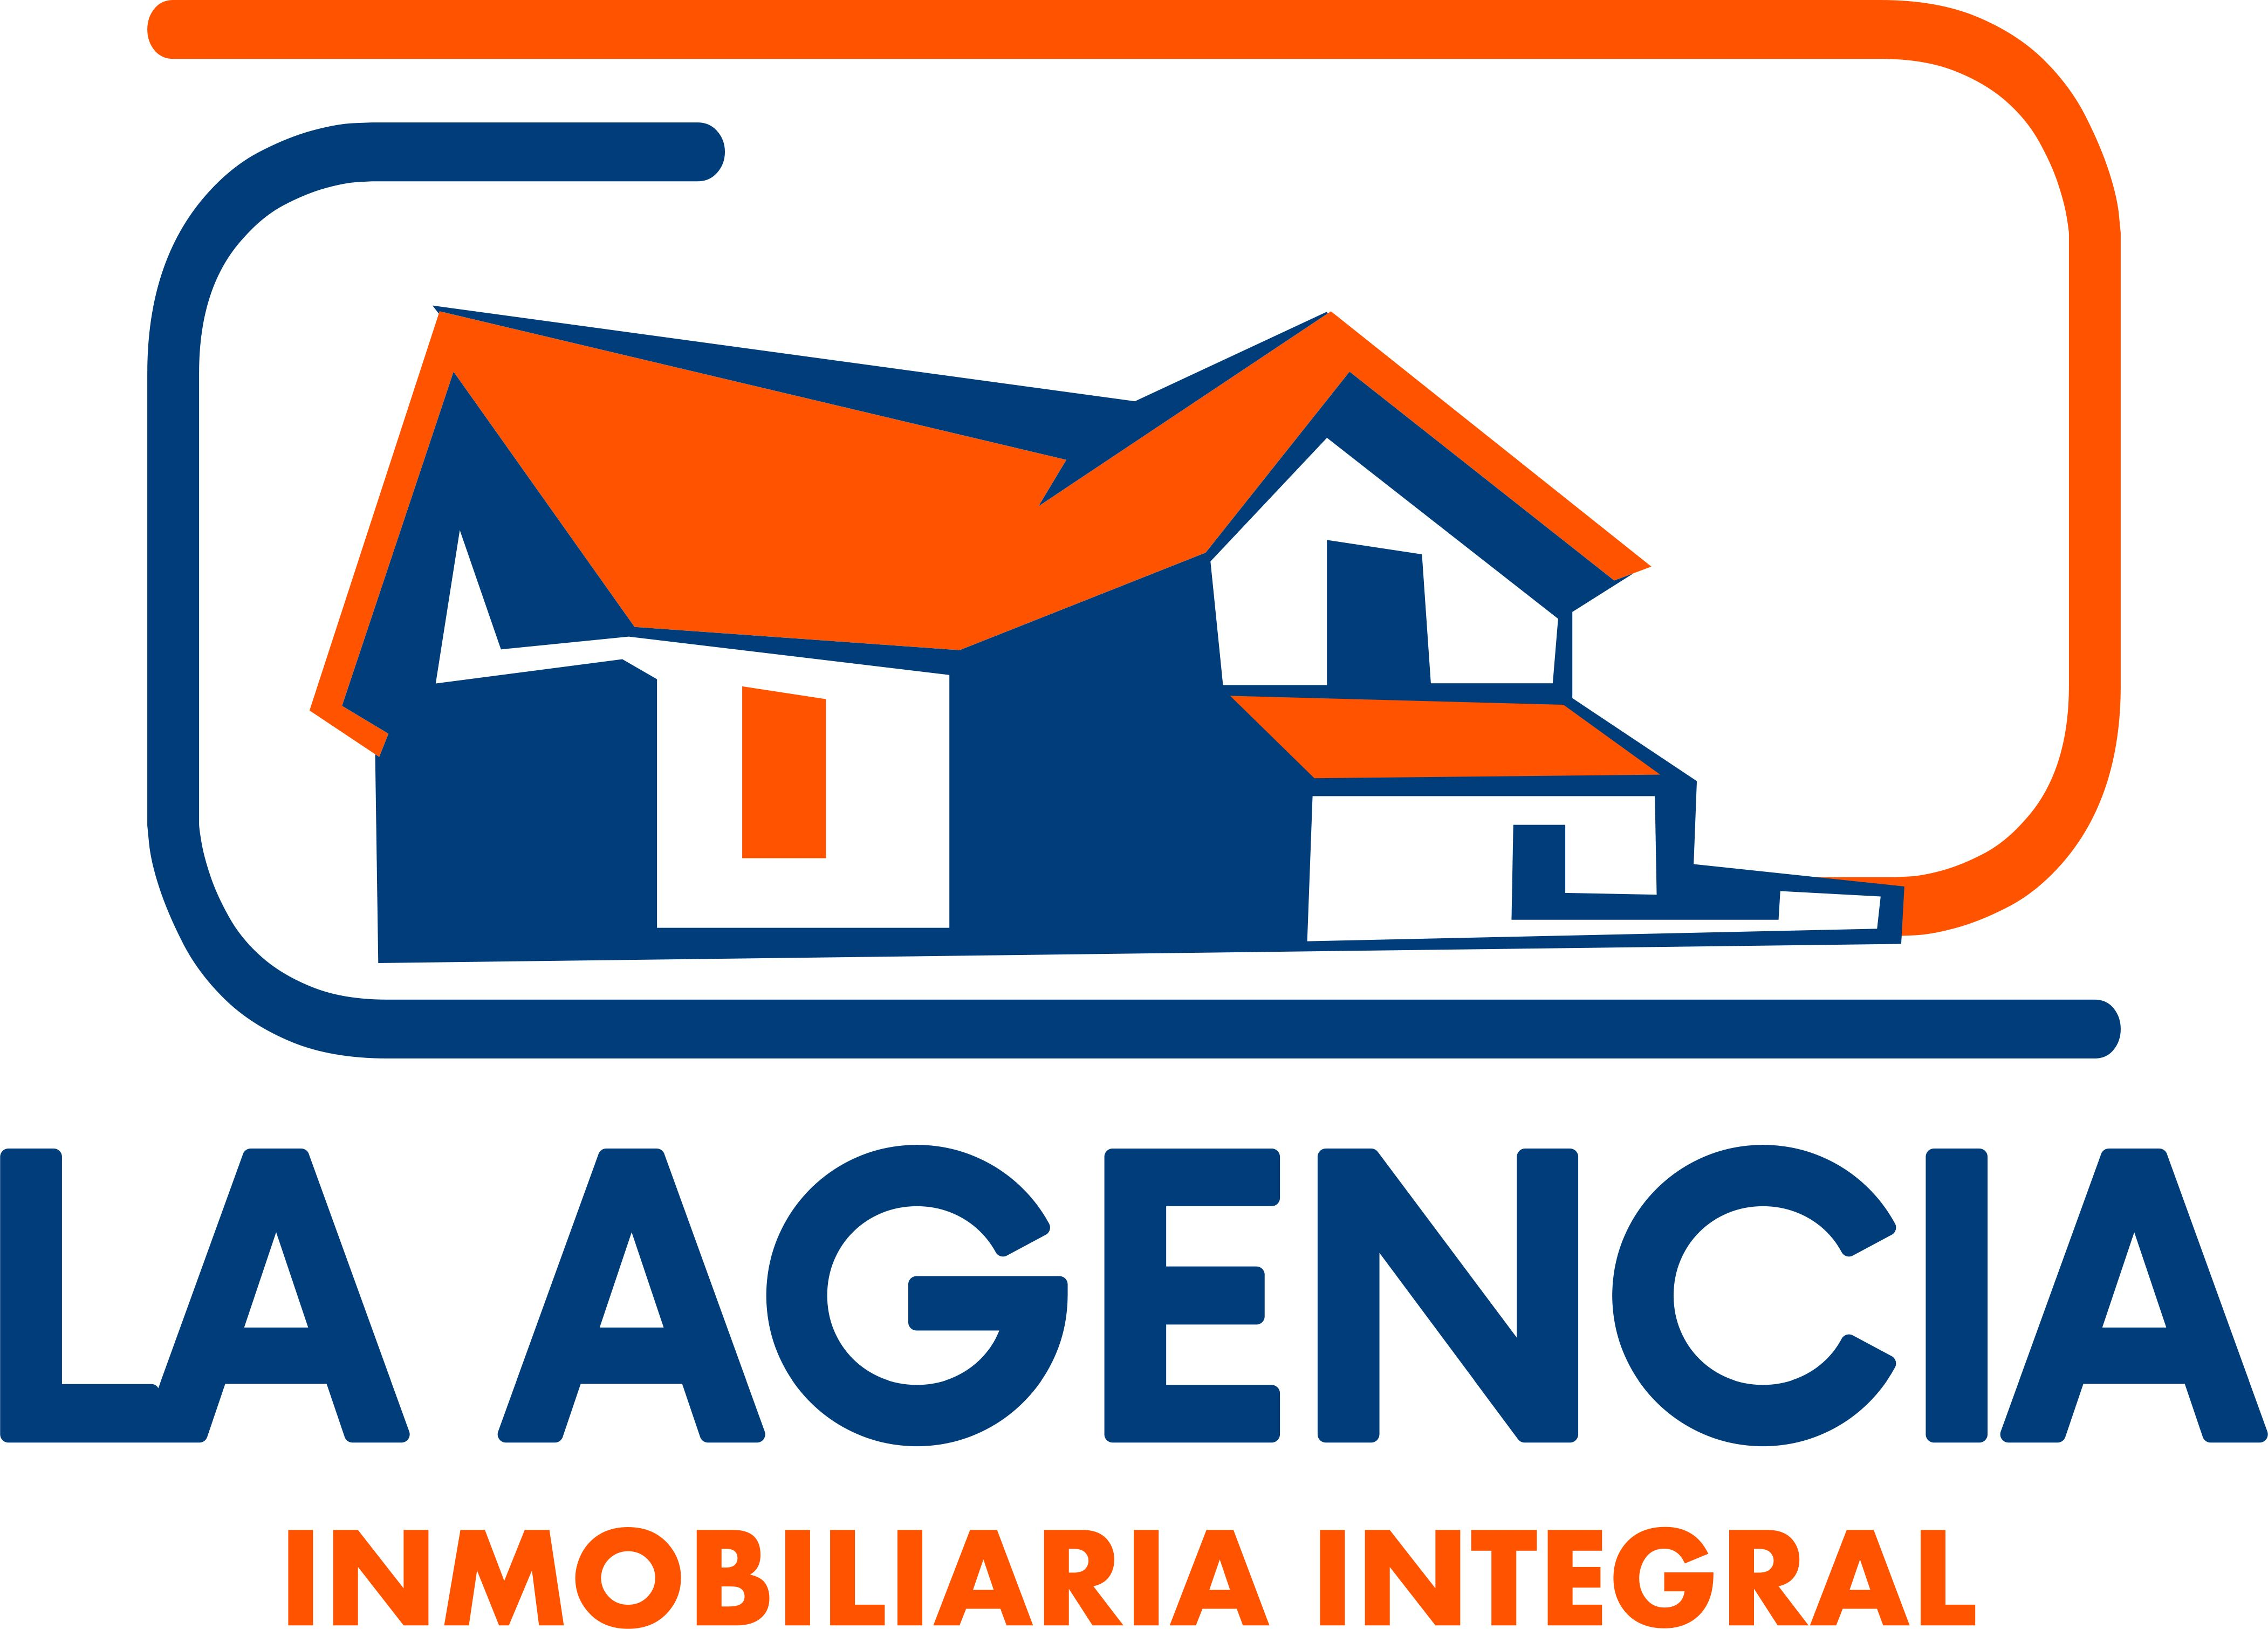 Logo de  Laagenciainmobiliariaintegral